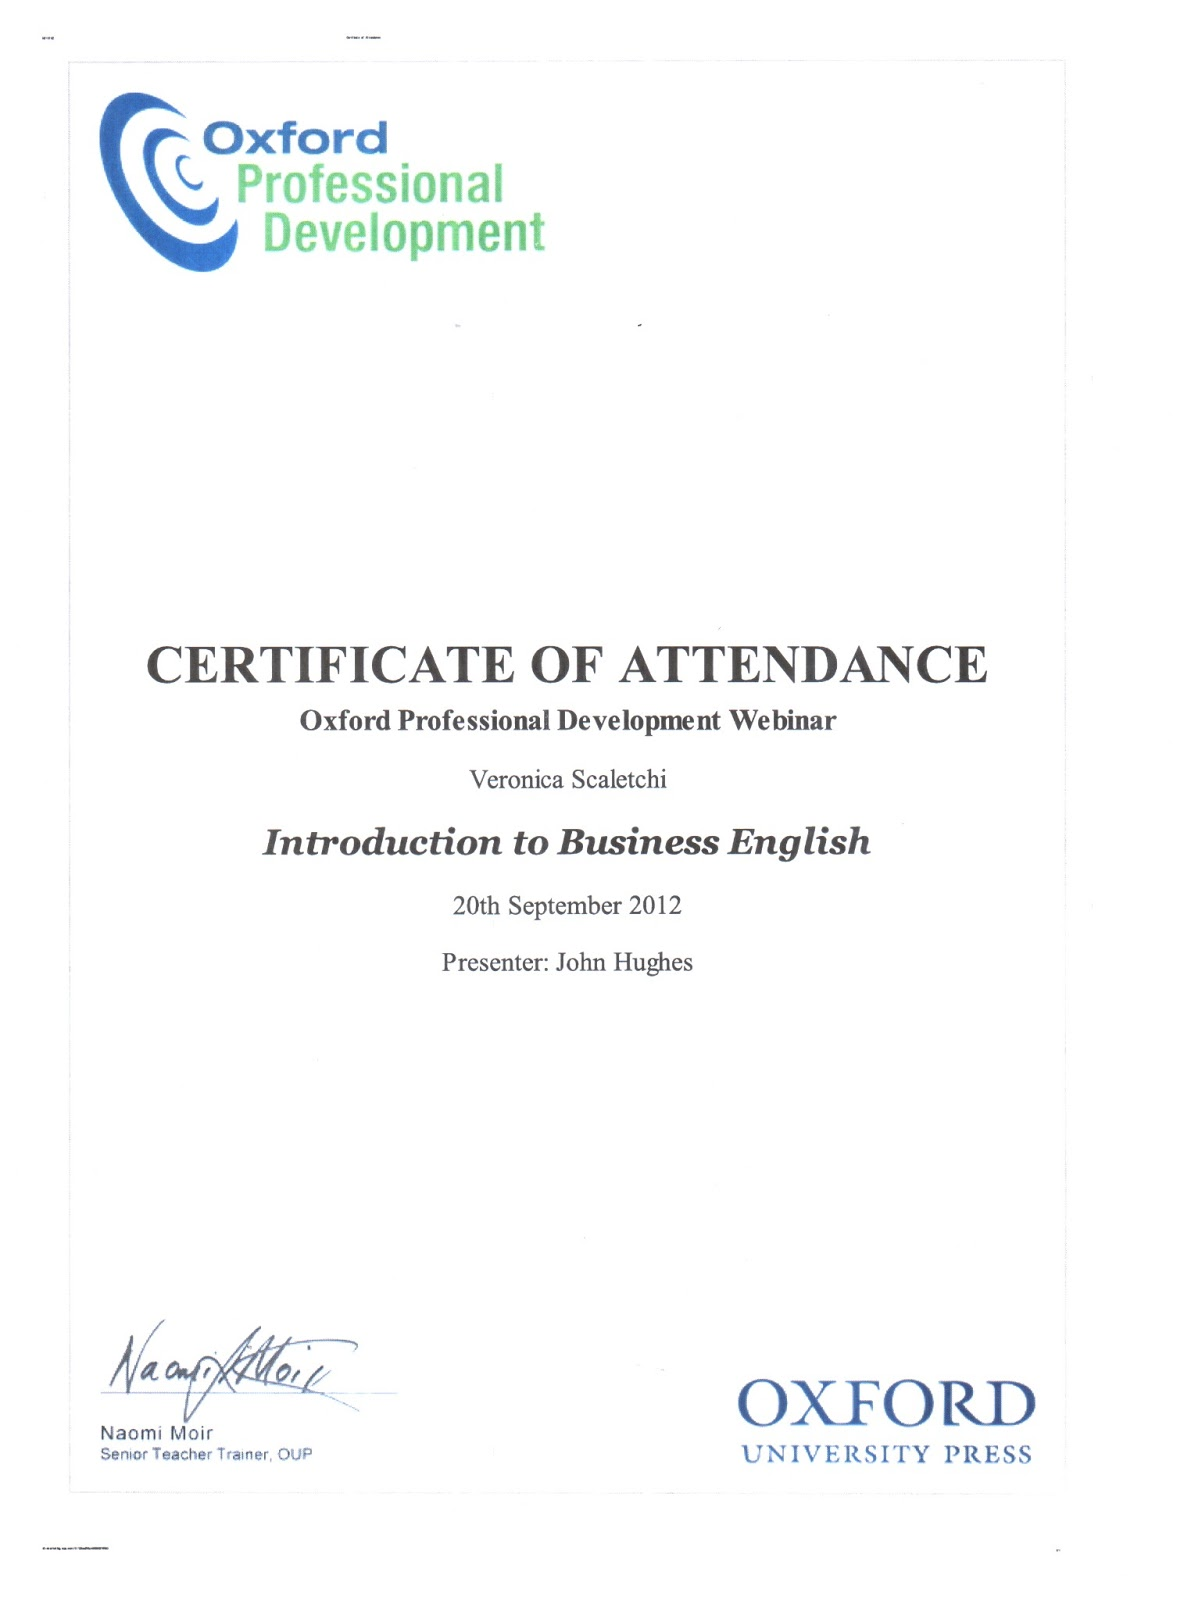 Lingua franca veronica skaletski international certification 1betcityfo Images